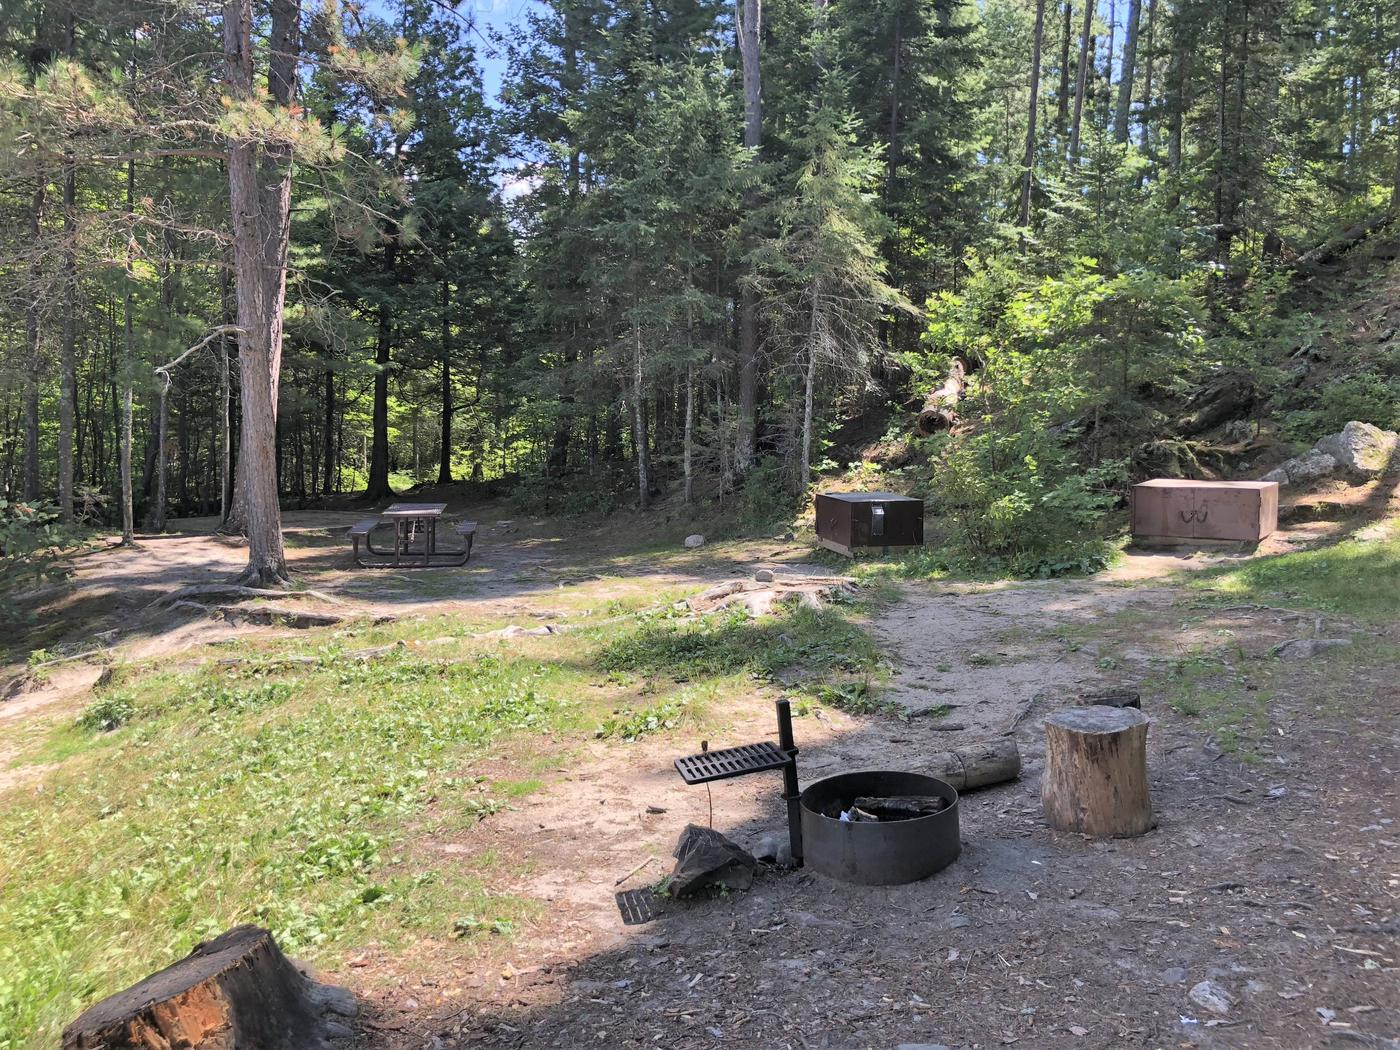 N25 - My Island WestView of campsite